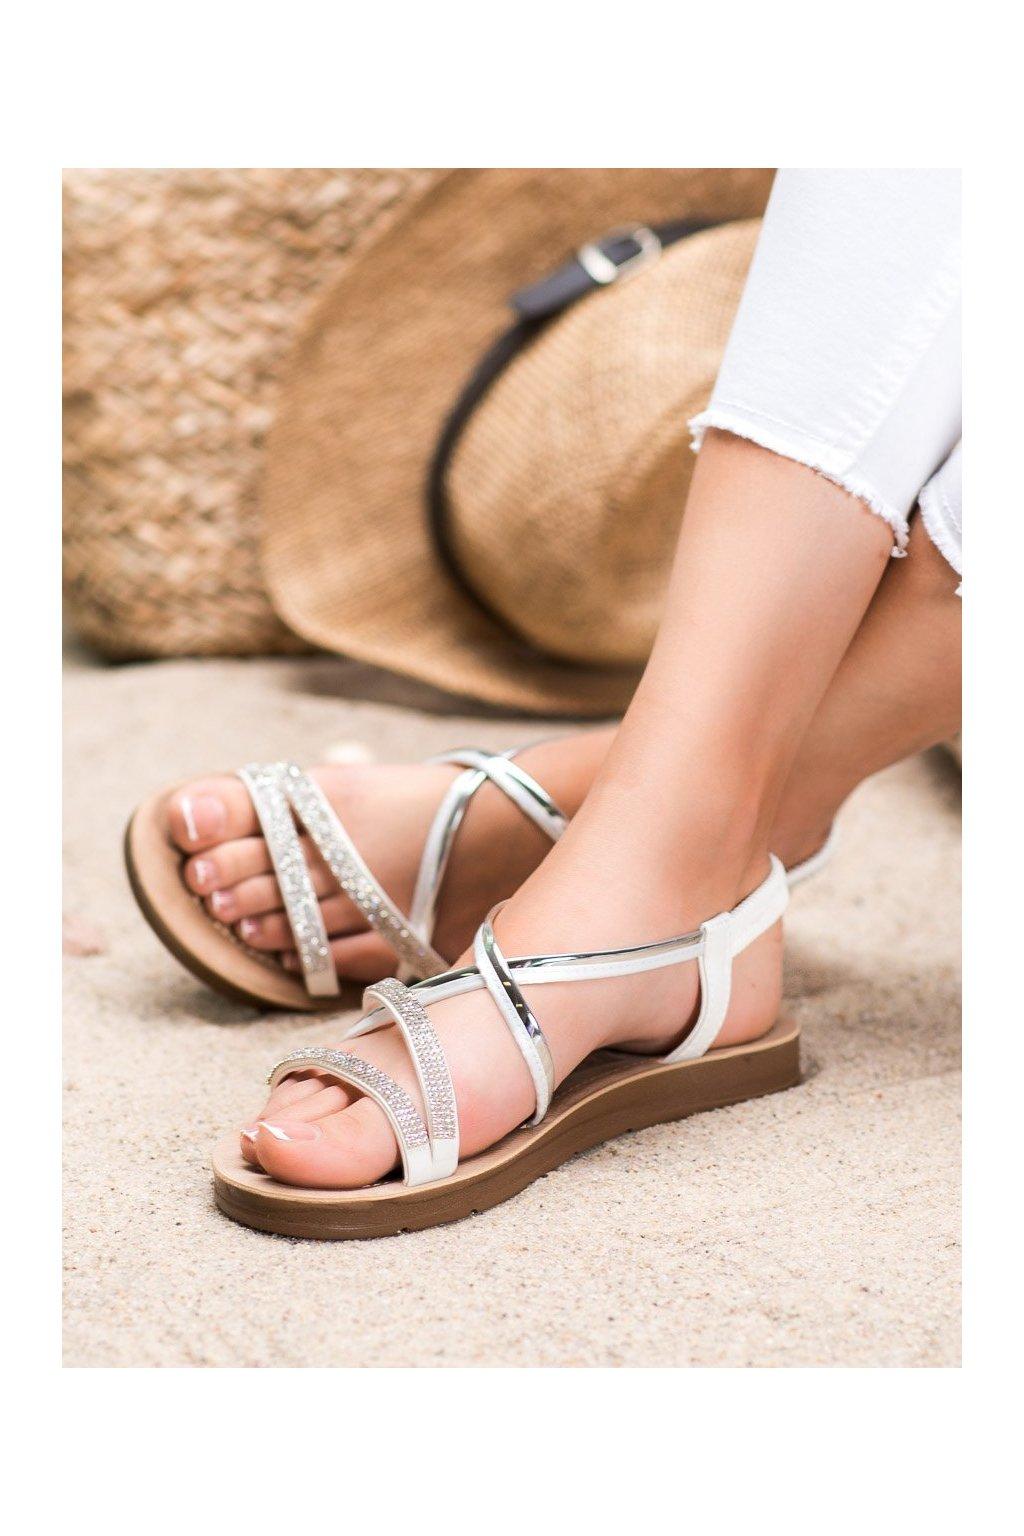 Biele sandále Sea elves kod 6417W/